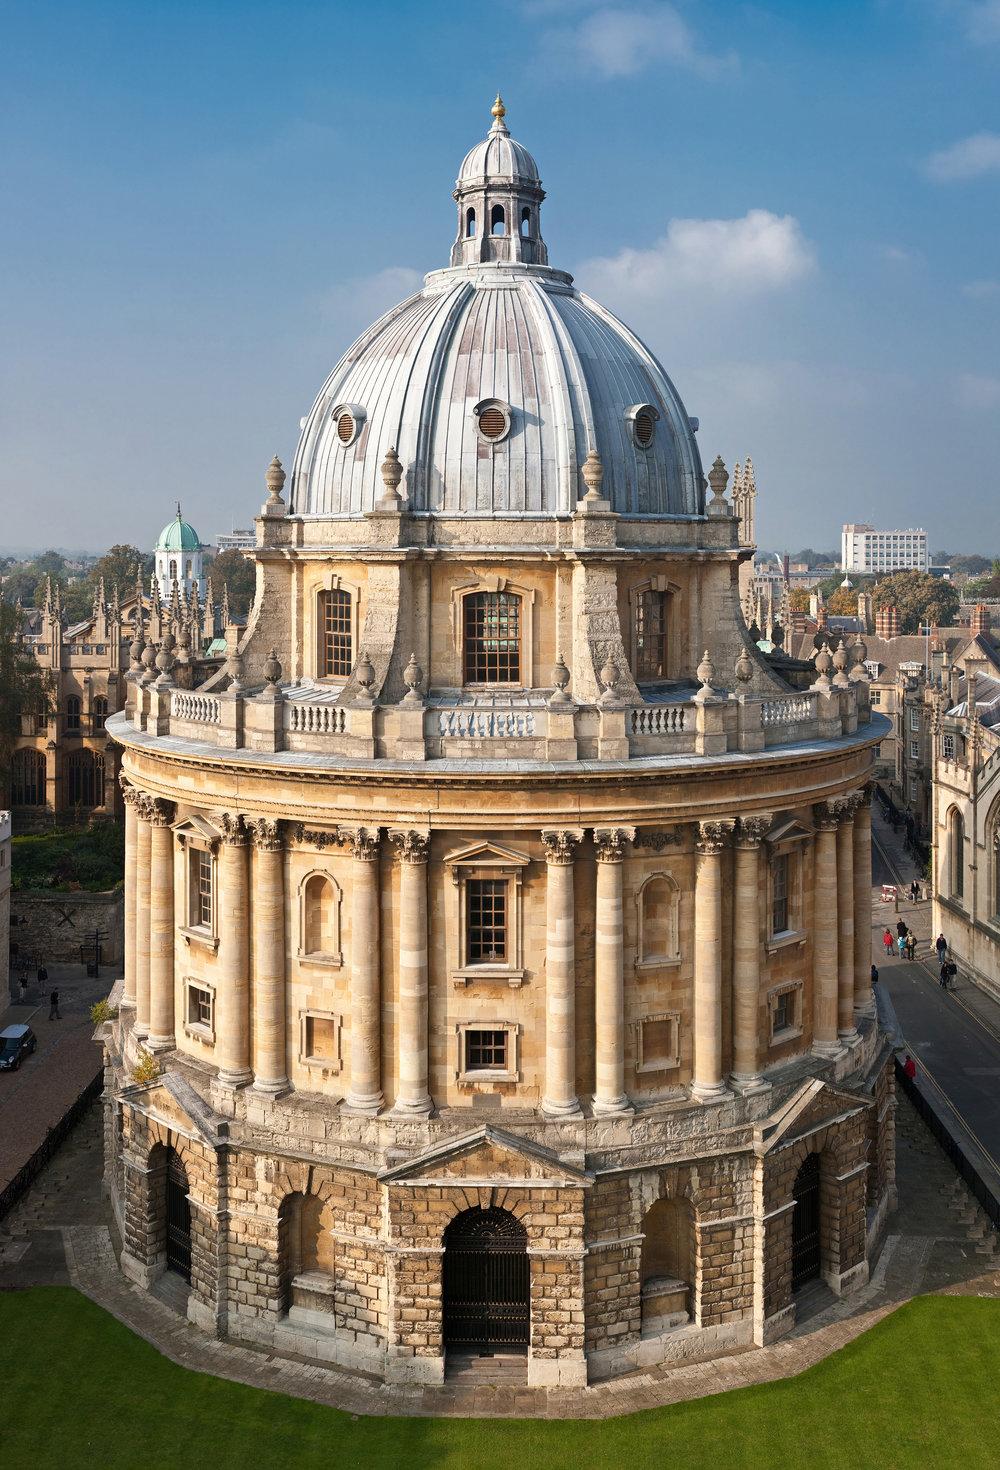 Radcliffe_Camera,_Oxford_-_Oct_2006.jpg